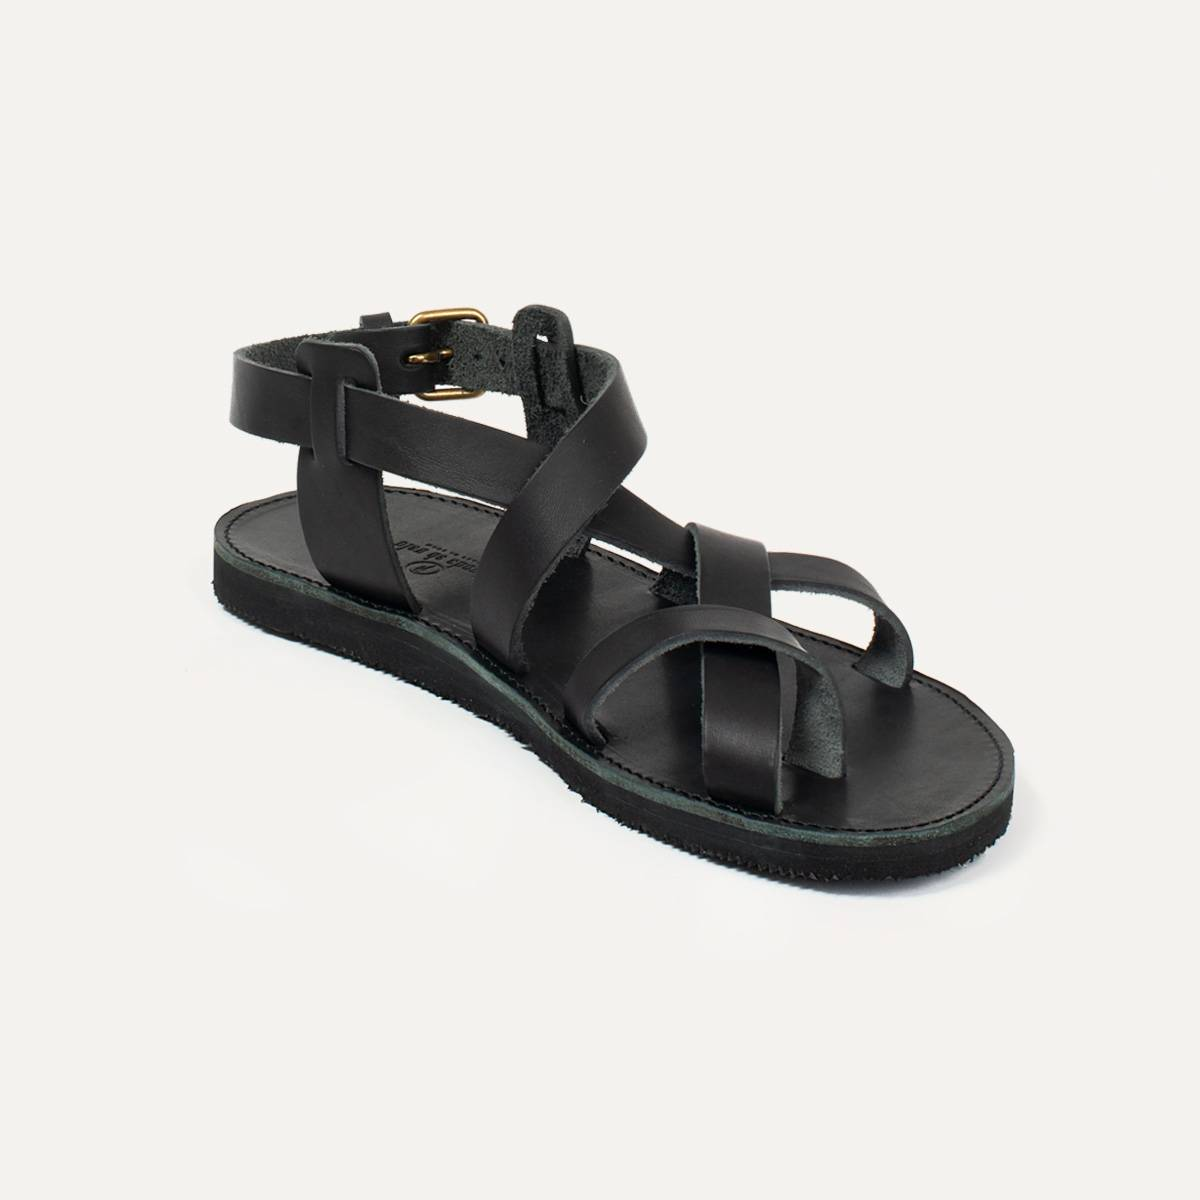 Lhassa leather sandals - Black (image n°2)